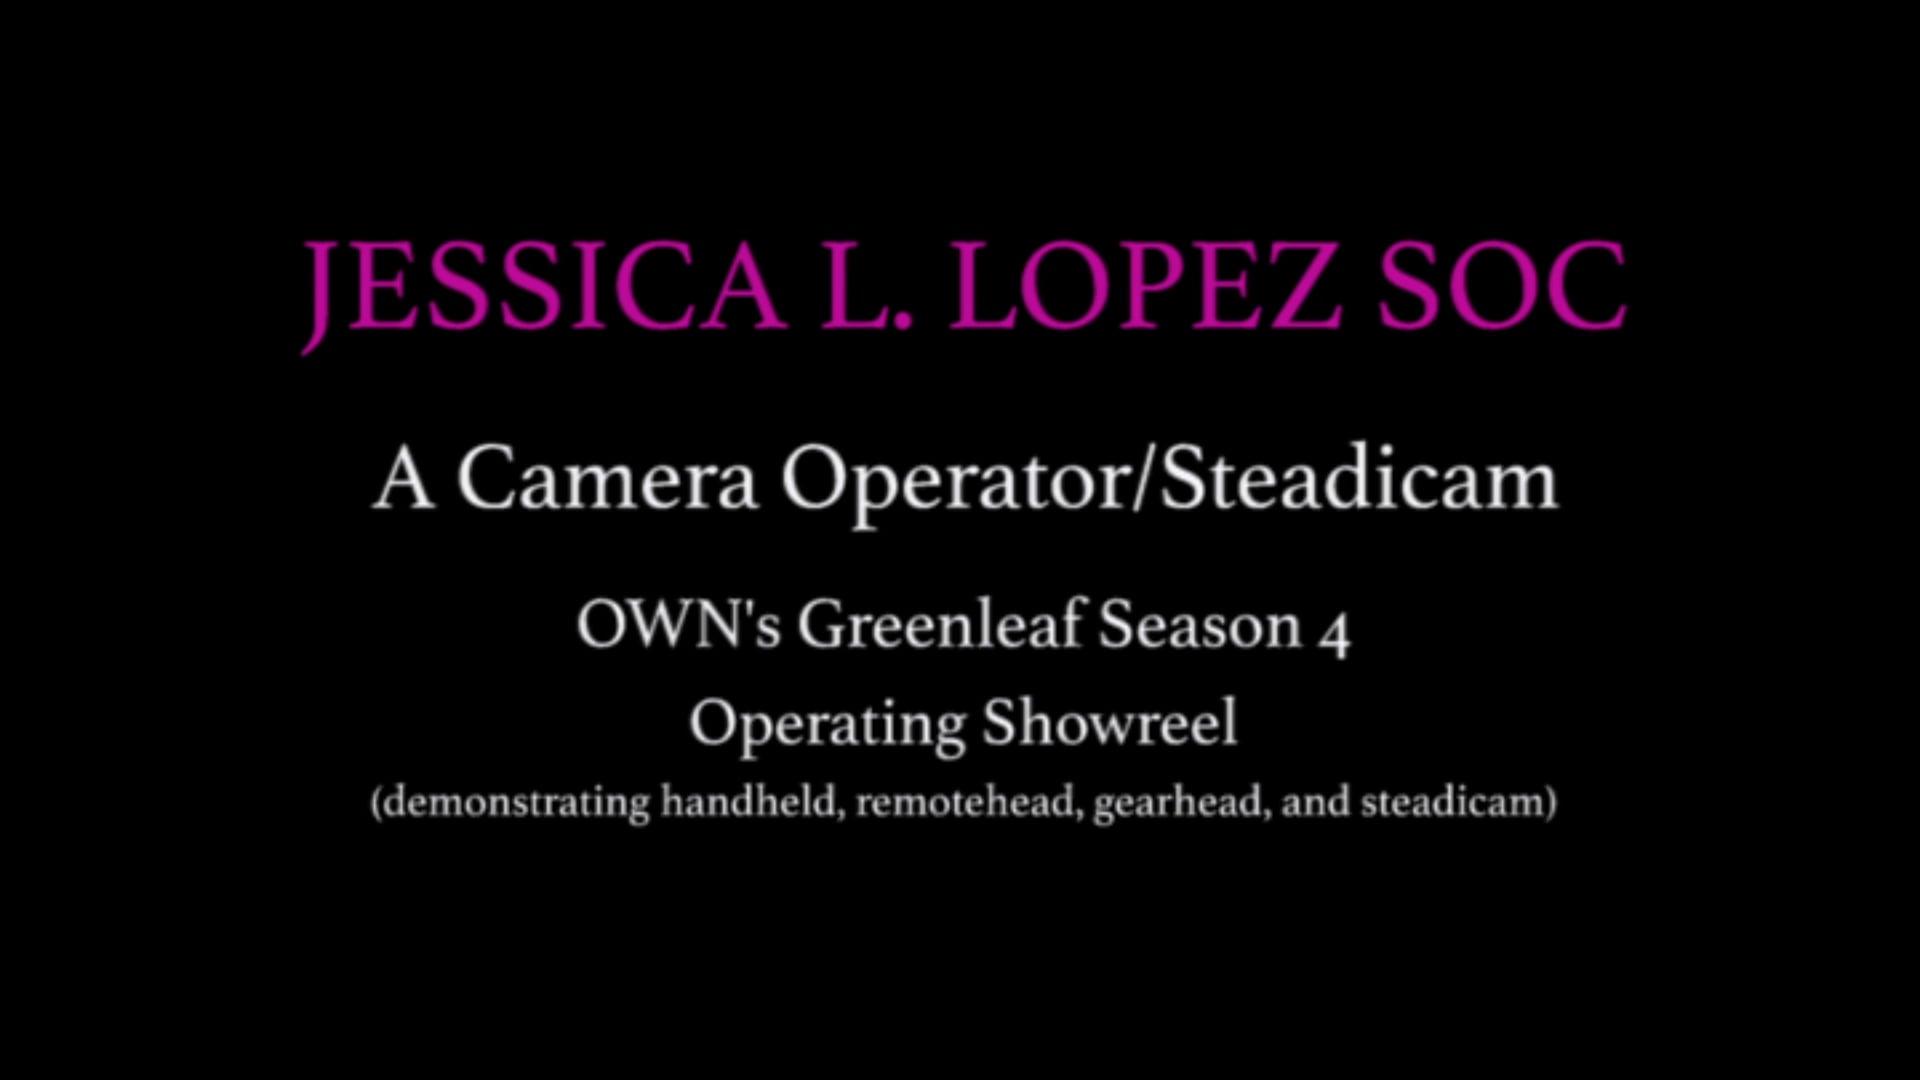 Drama Operating Showreel